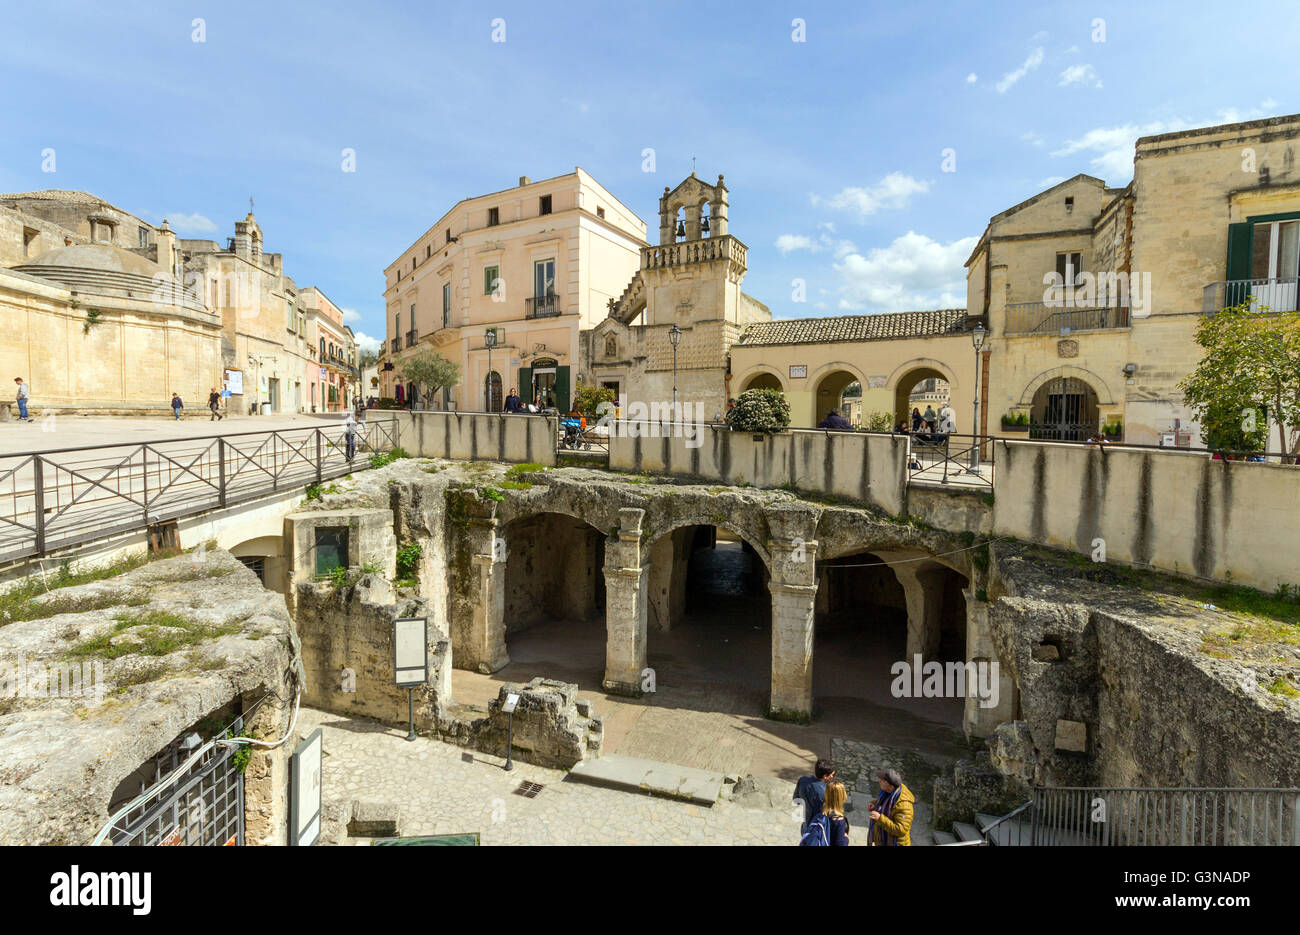 Italy, Basilicata, Matera, Materdomini church and Santo Spirito church - Stock Image